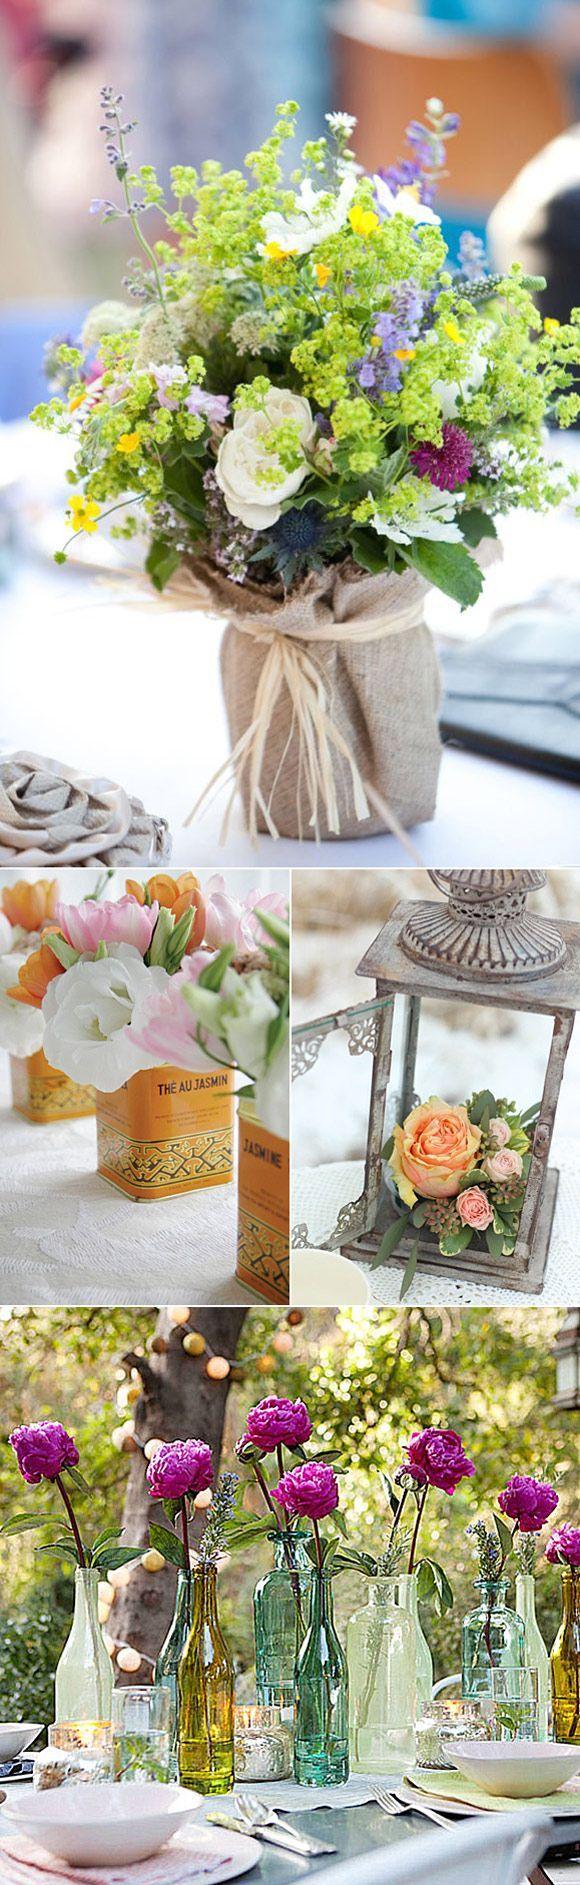 39 best images about wedding flowers on pinterest - Ideas para decorar jardines ...